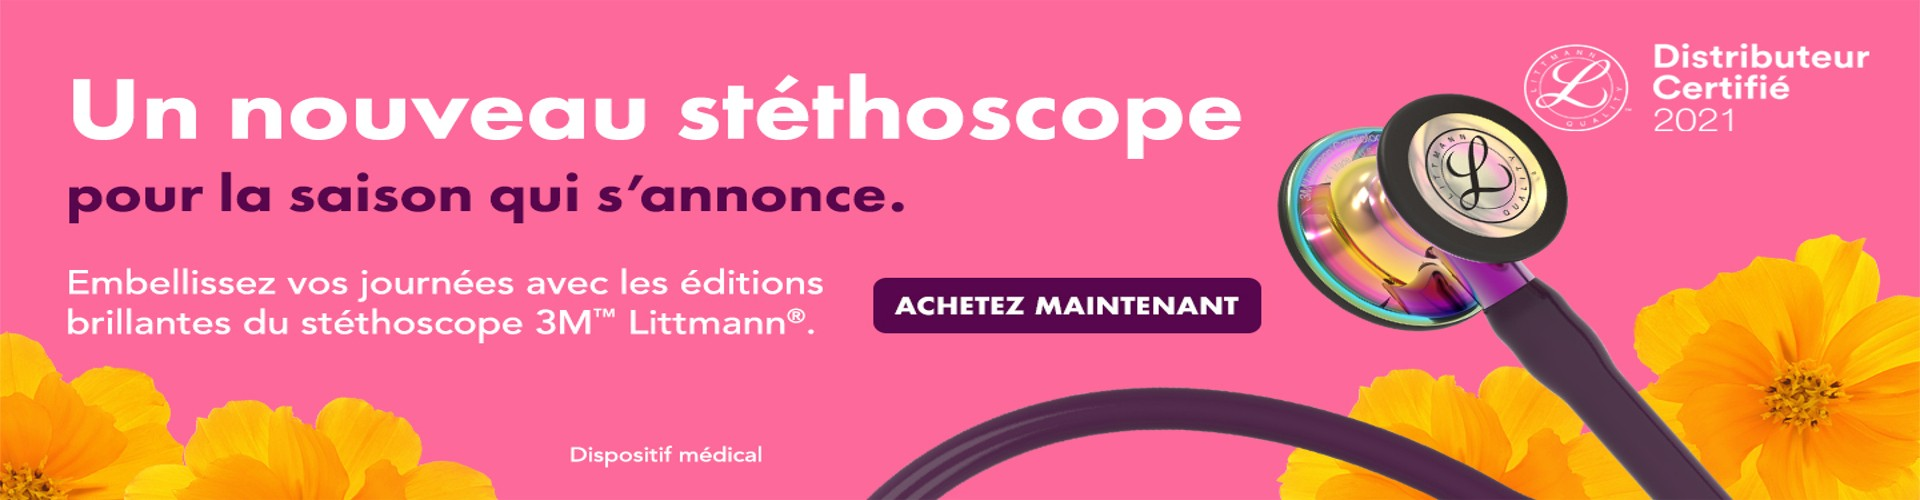 Stéthoscope Prune, Cardiology IV